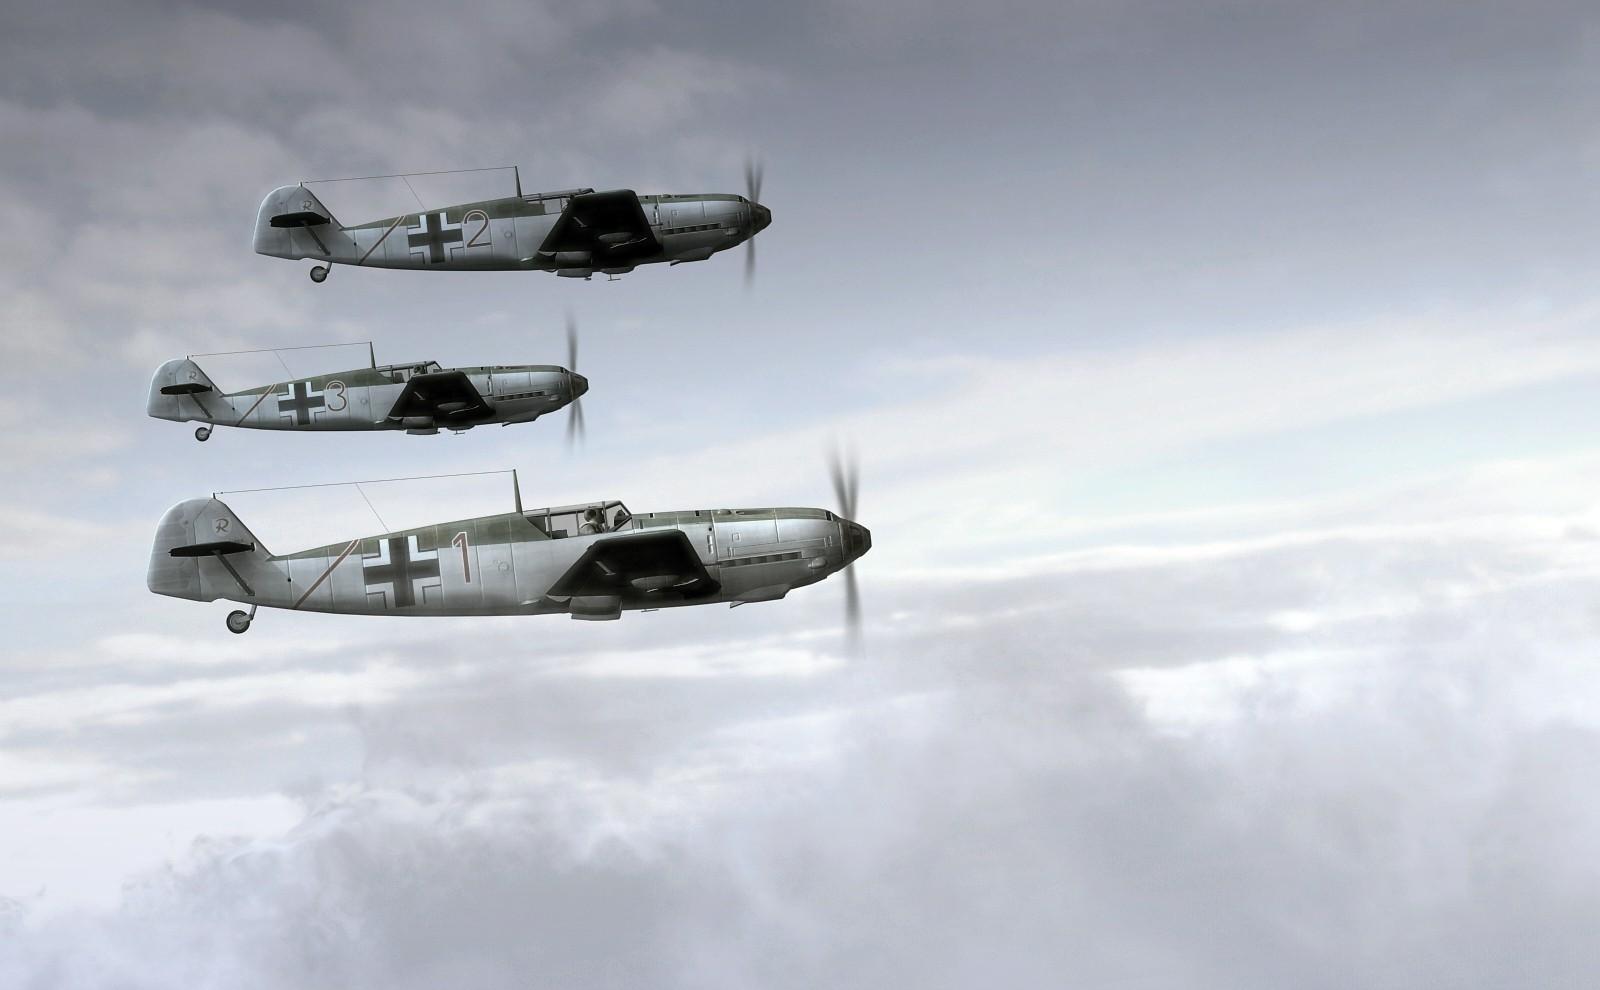 1600x990 px aircraft airplane Germany Luftwaffe Messerschmitt Messerschmitt Bf 109 military military aircraft World War II